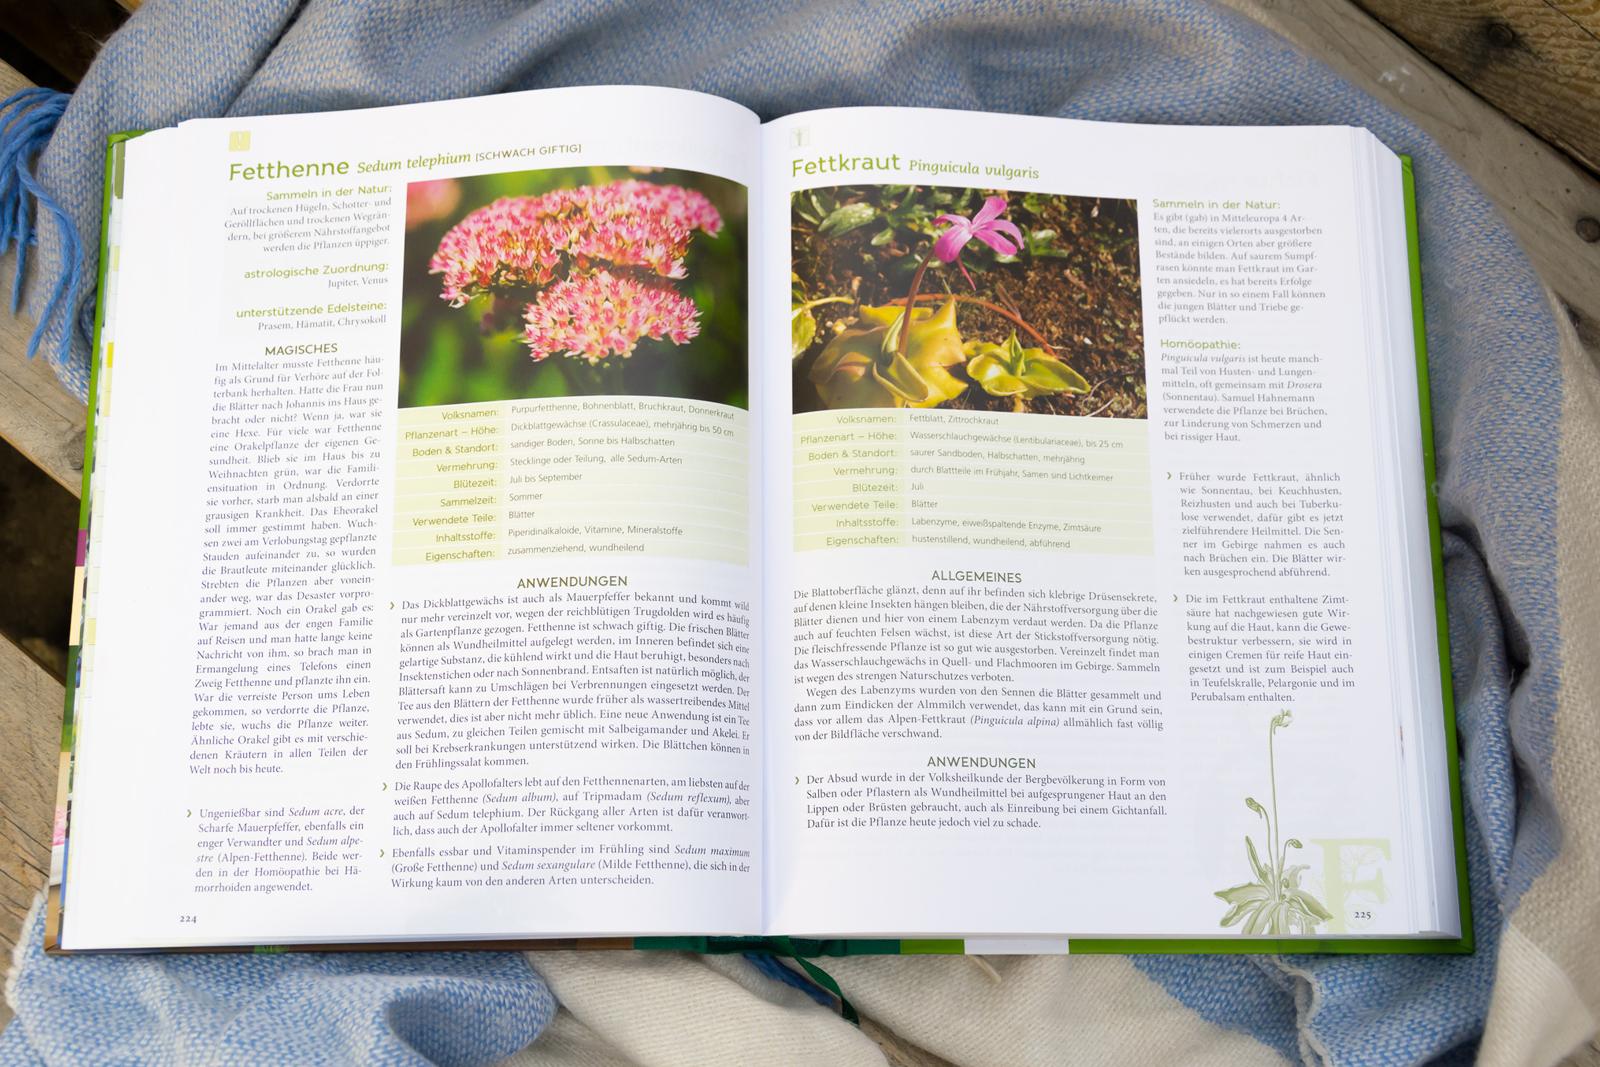 Die toll beschriebenen Pflanzenportraits